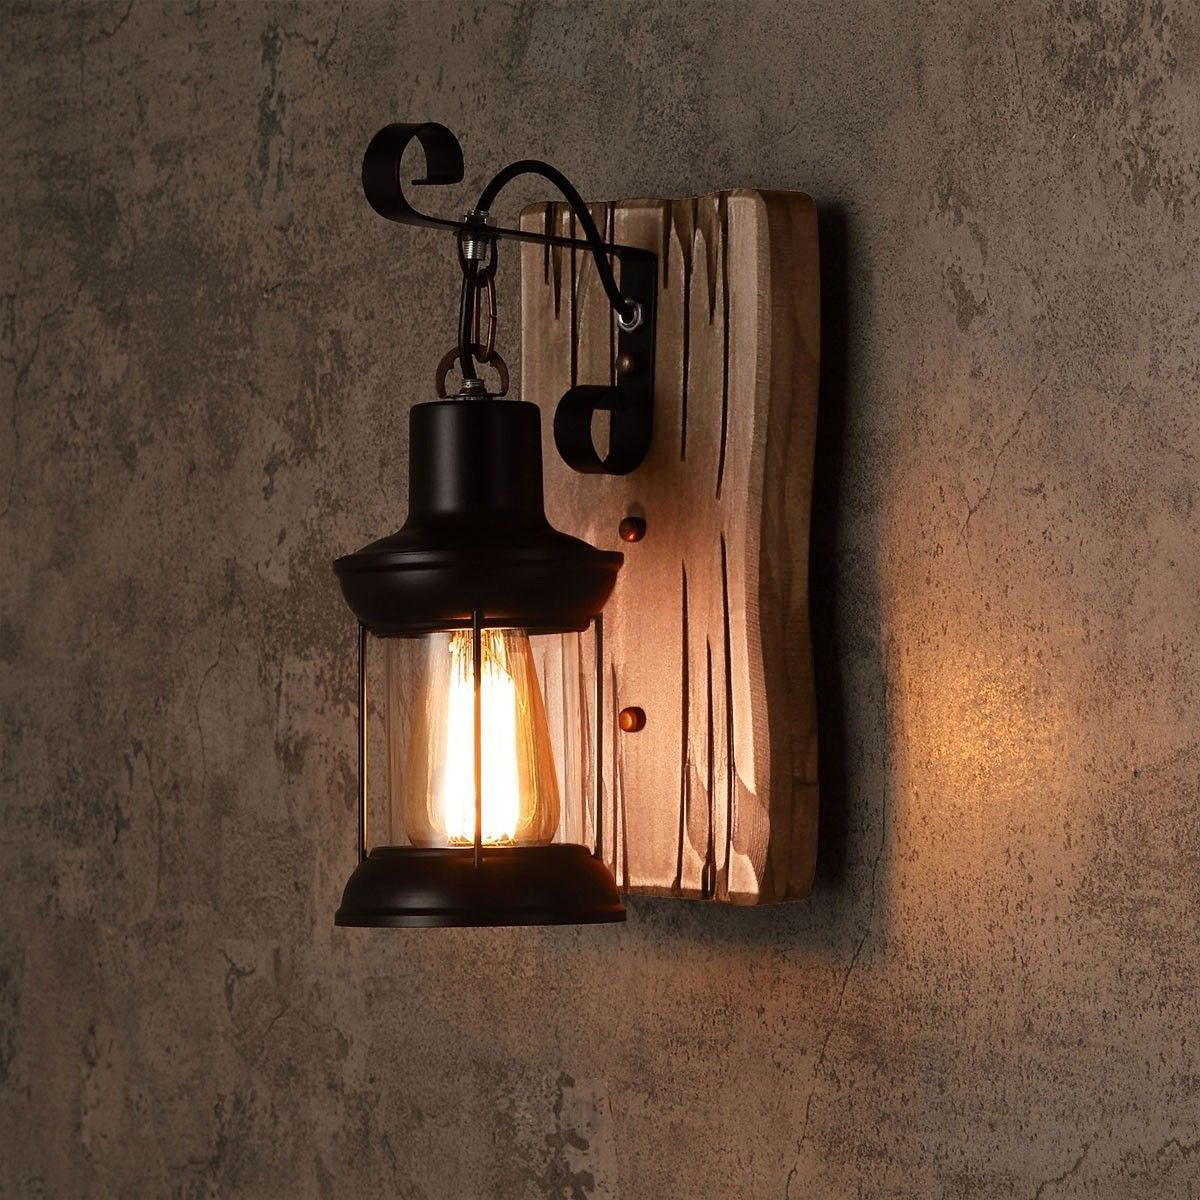 Wandleuchte Mit Klarglas Metalllaterne Und Holzruckplatte Rustic Wall Sconces Glass Lantern Rustic Wall Lighting